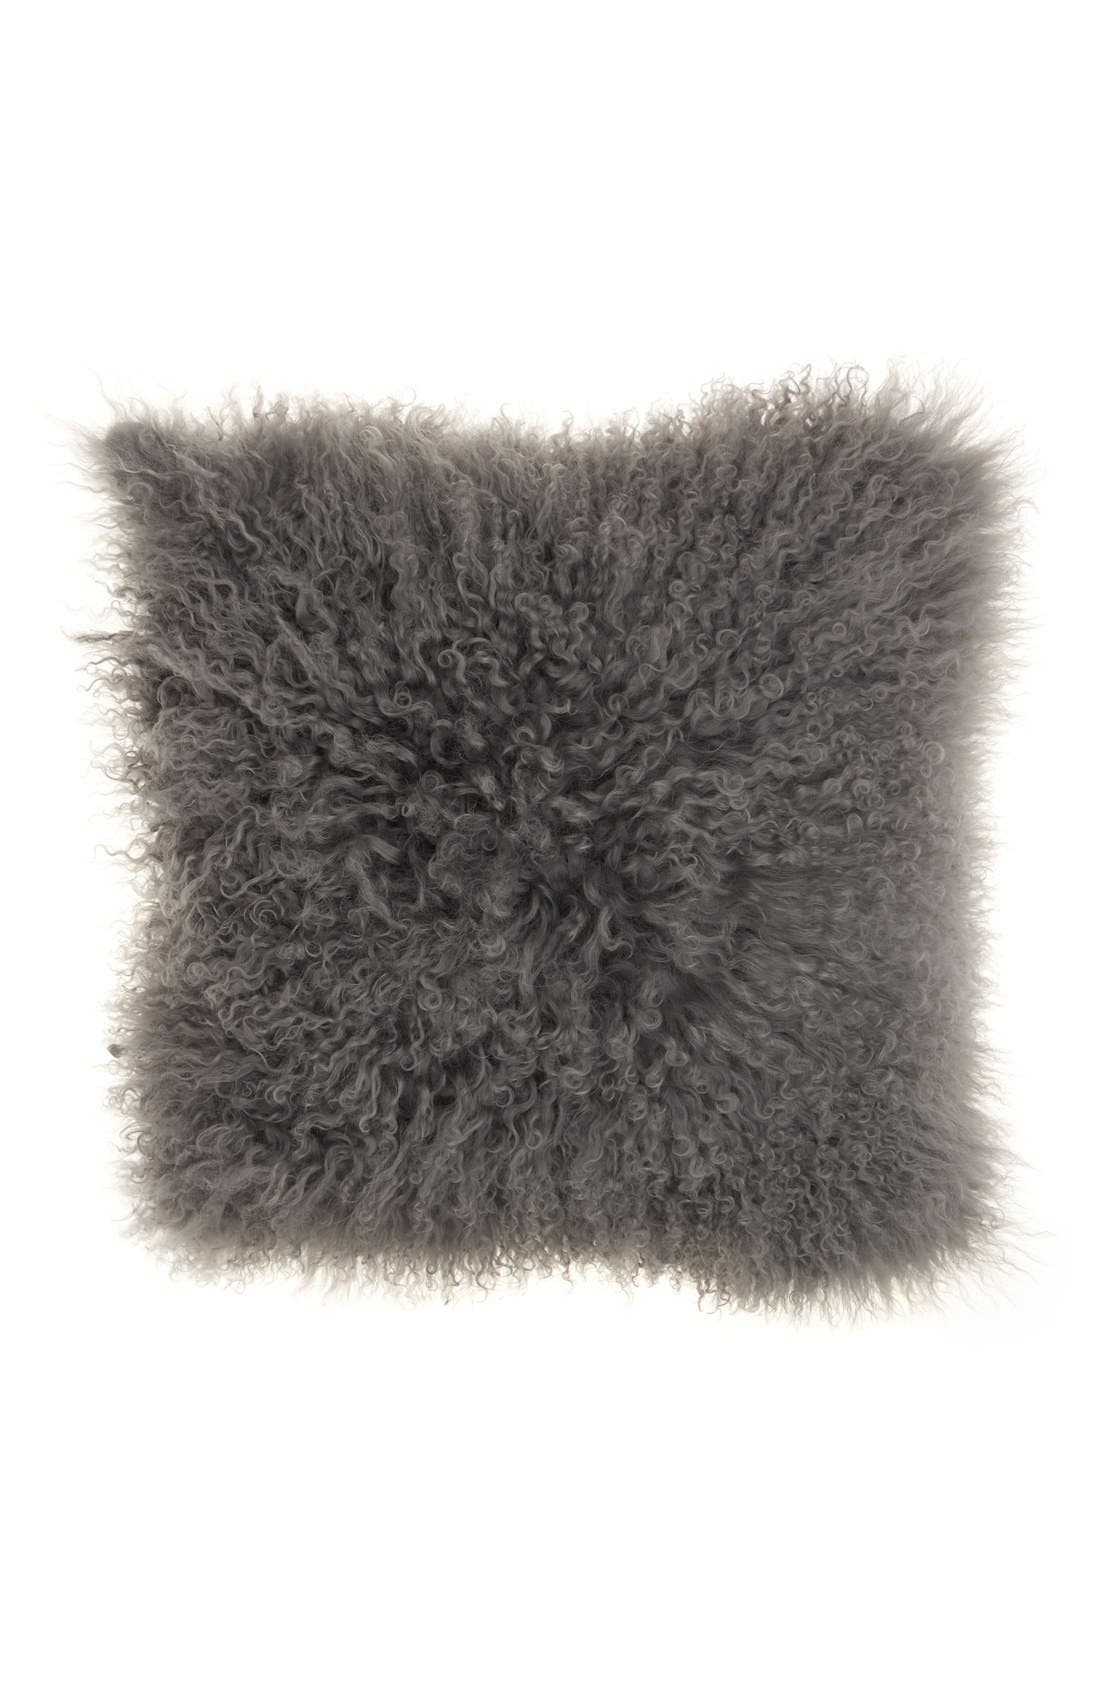 Genuine Tibetan Wool Shearling Pillow,                             Main thumbnail 1, color,                             SILVER/ GREY